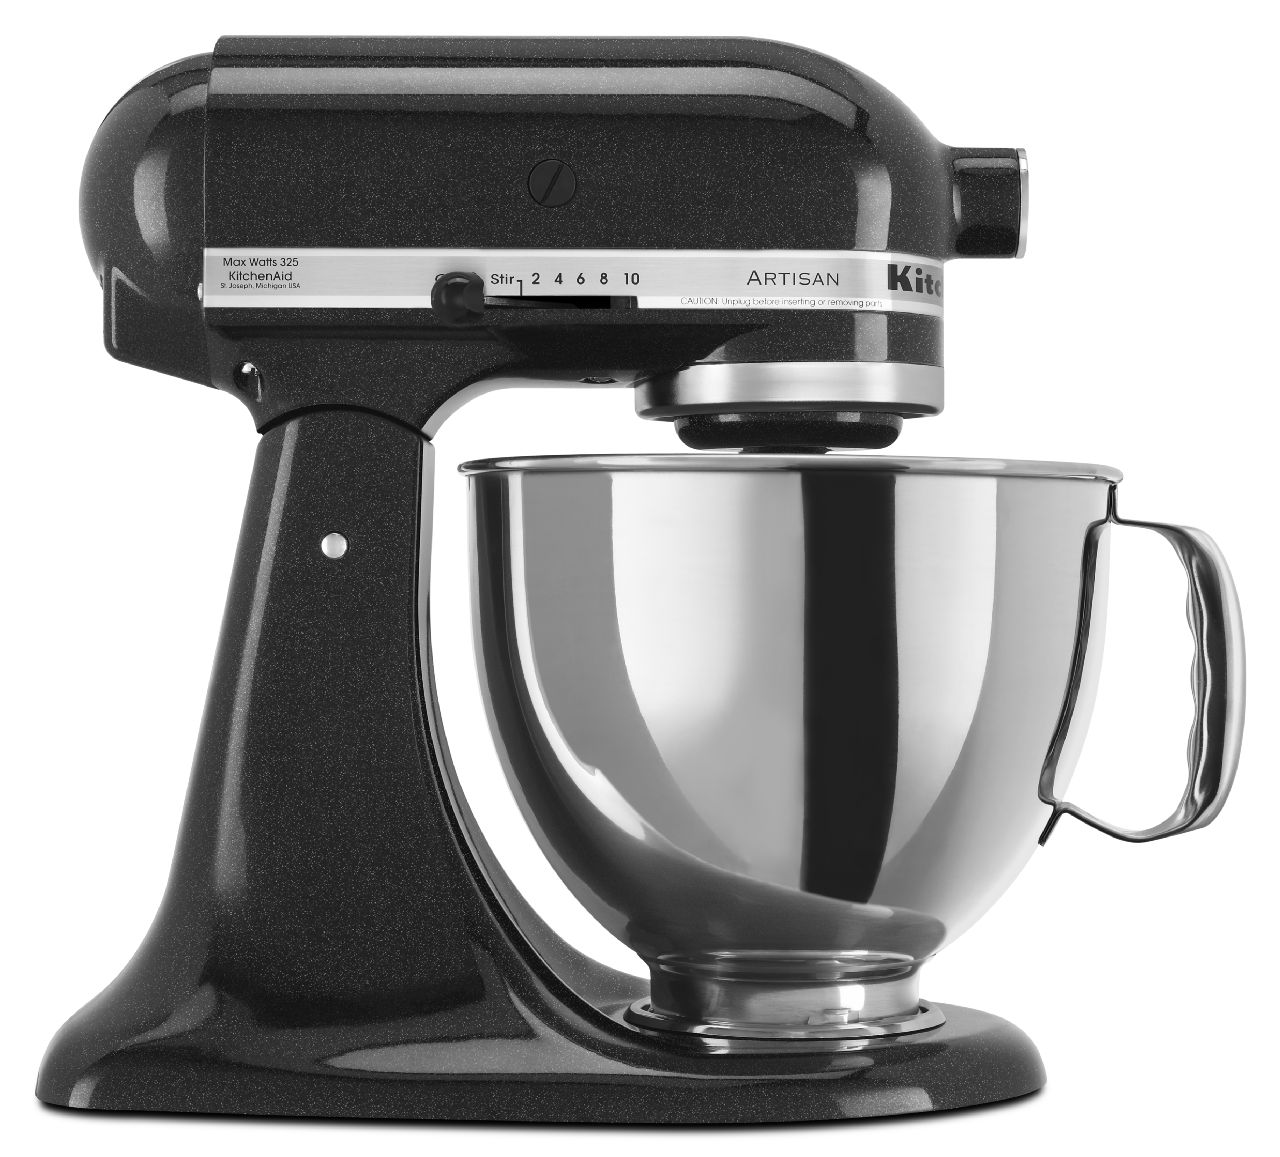 KitchenAid-Artisan-Series-5-Quart-Tilt-Head-Stand-Mixer-10-Speeds-KSM150PS thumbnail 36